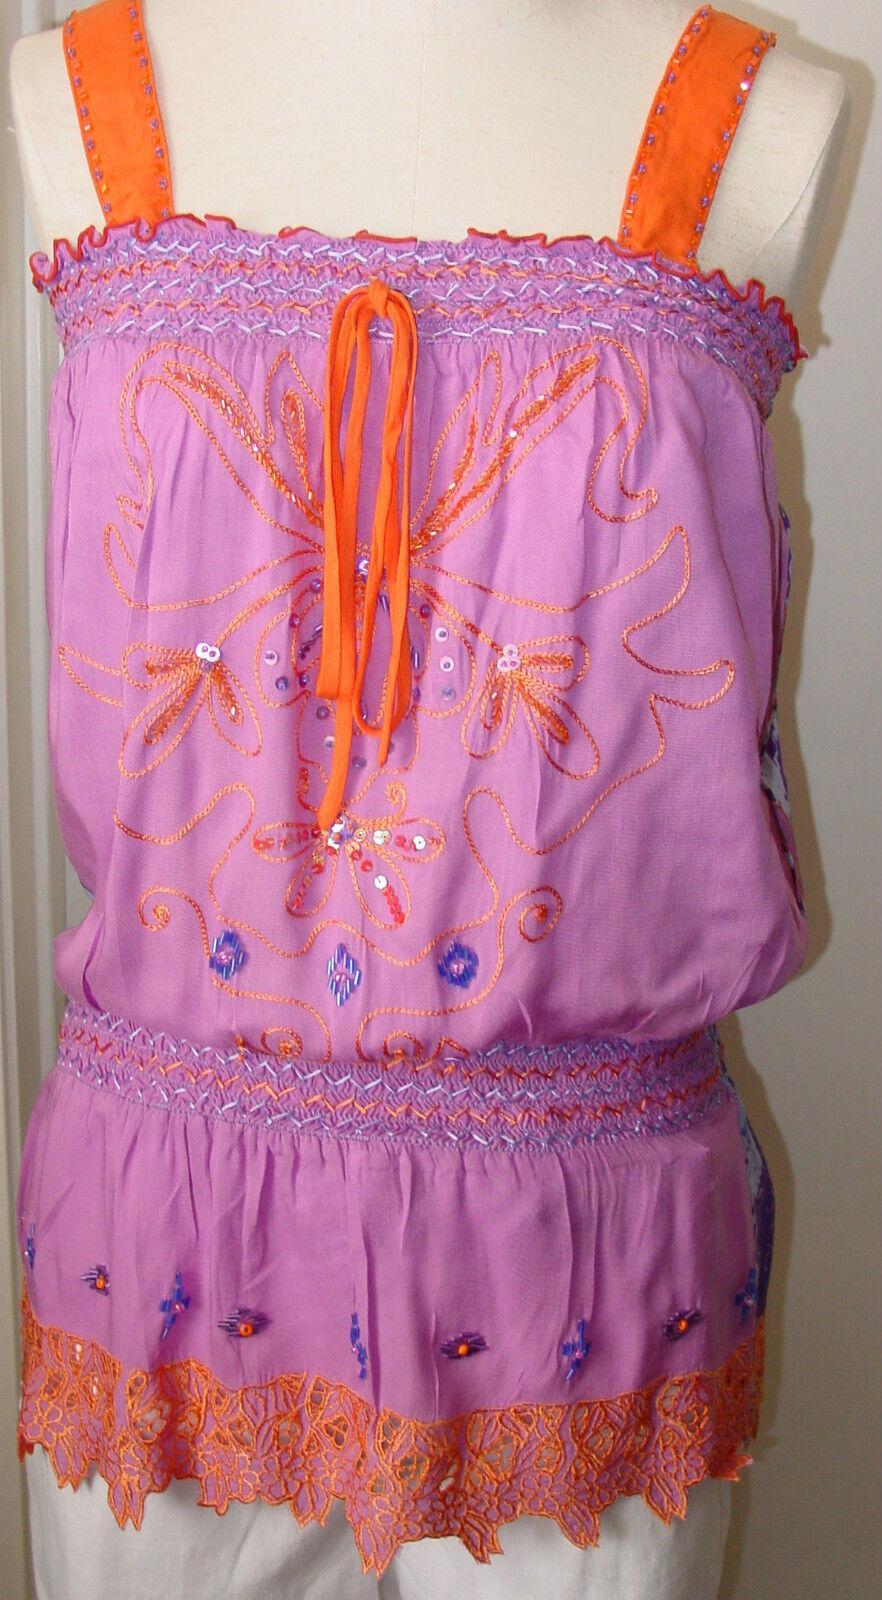 Woherren Top Lilac Rosa Orange Thin Strap Krista Lee Serpentine Embroidery Beads